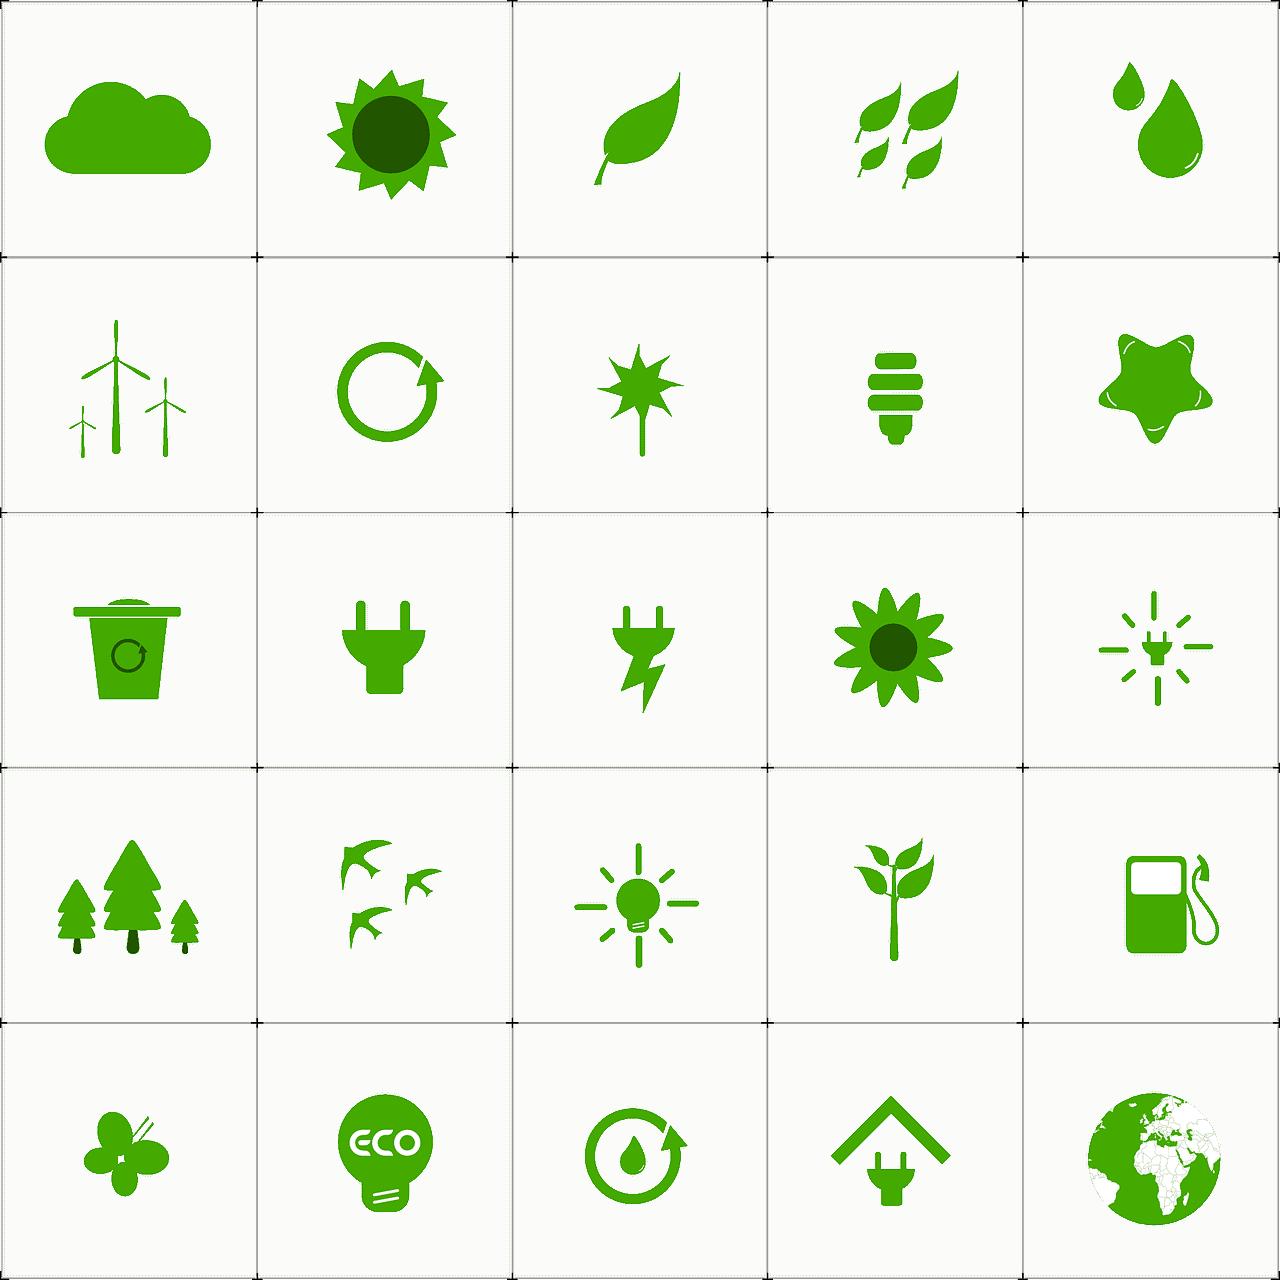 Zelene rešitve. Vir: Pixabay